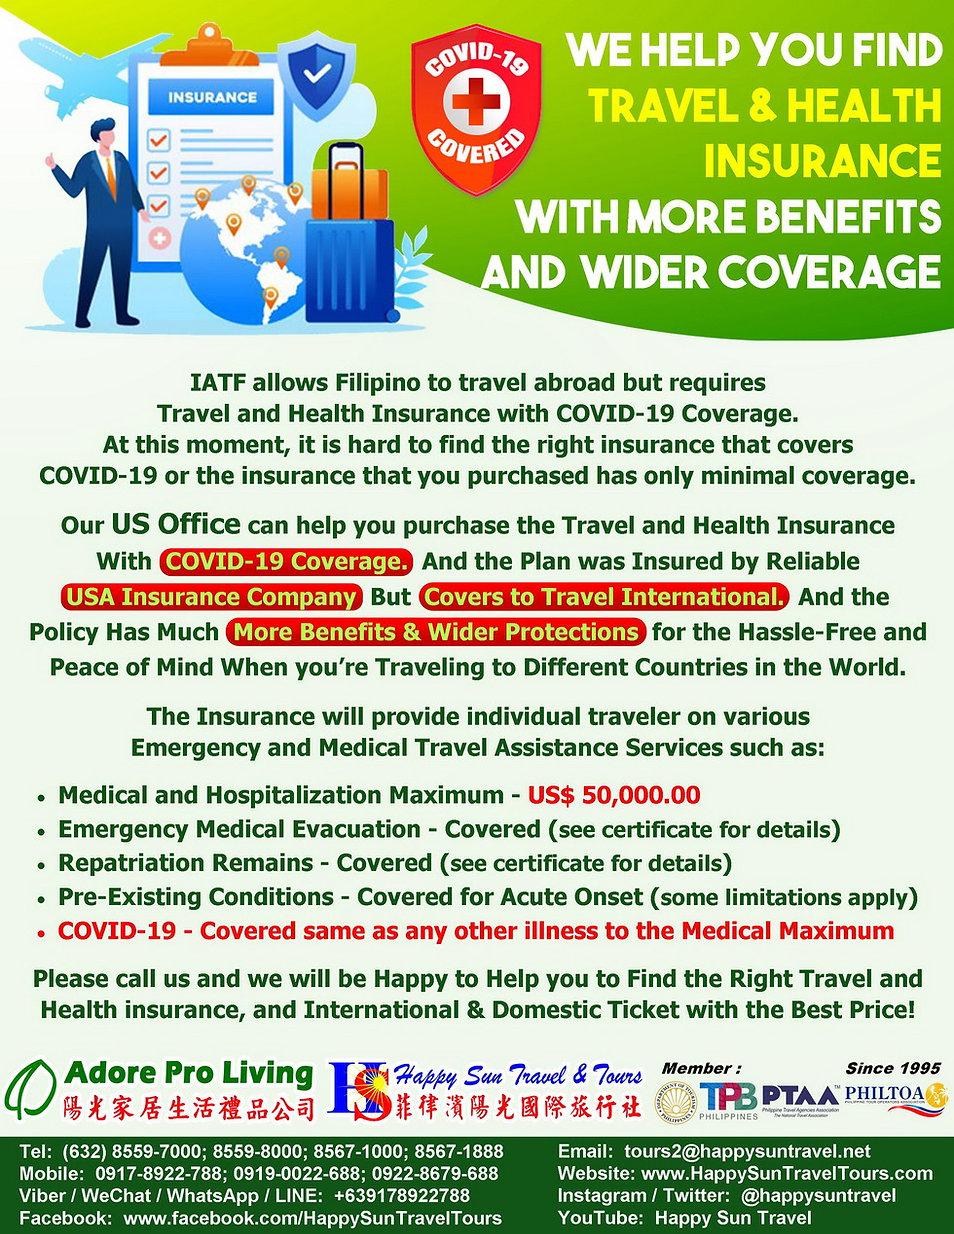 01_HappySunTravel_Travel&HealthInsurance